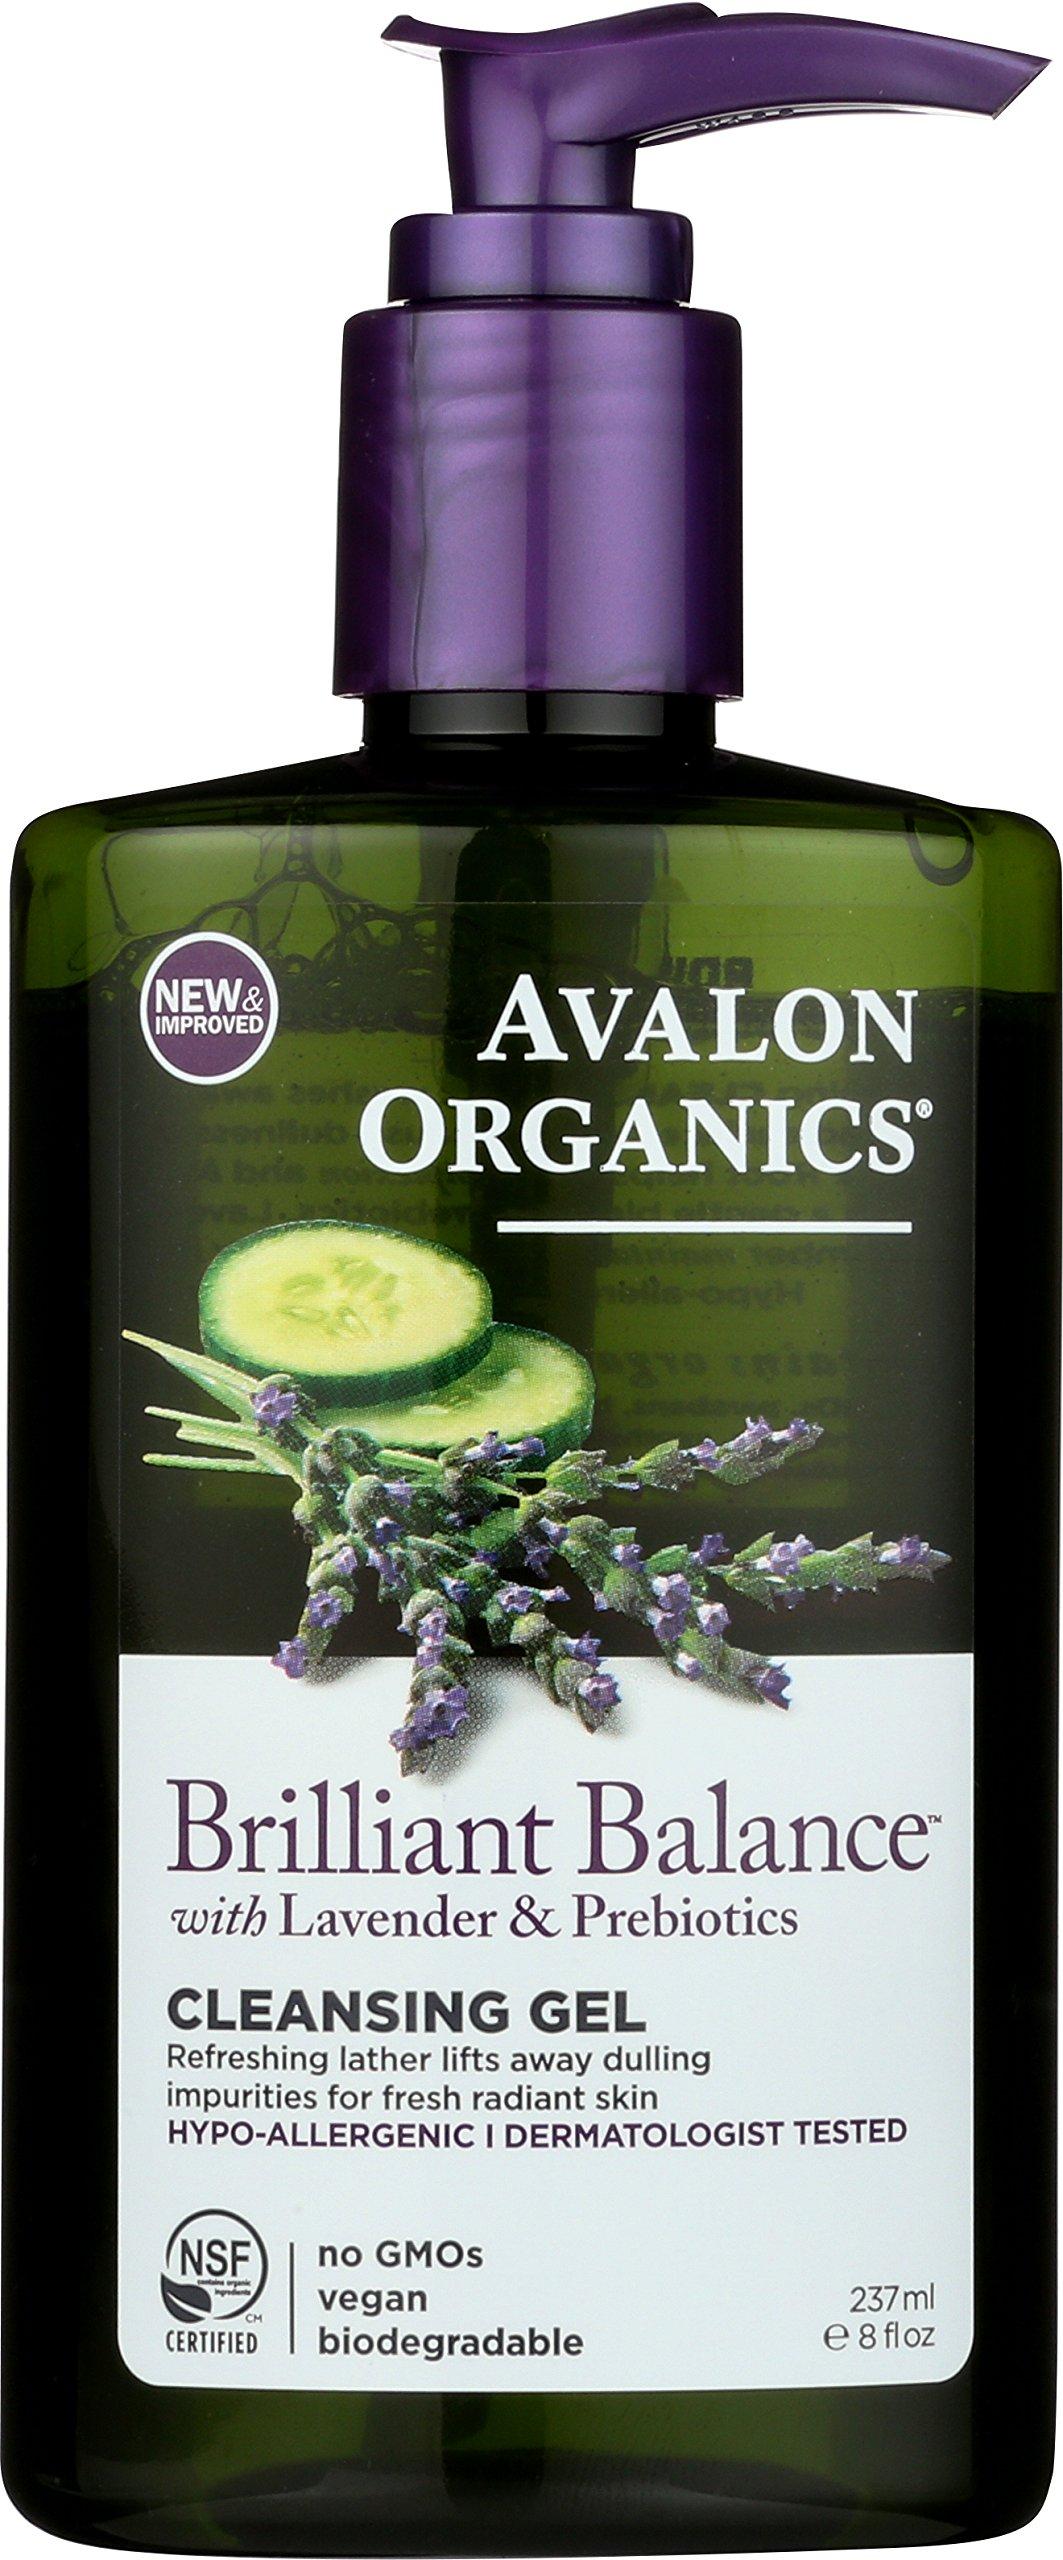 avalon organics brilliant balance cleansing gel review